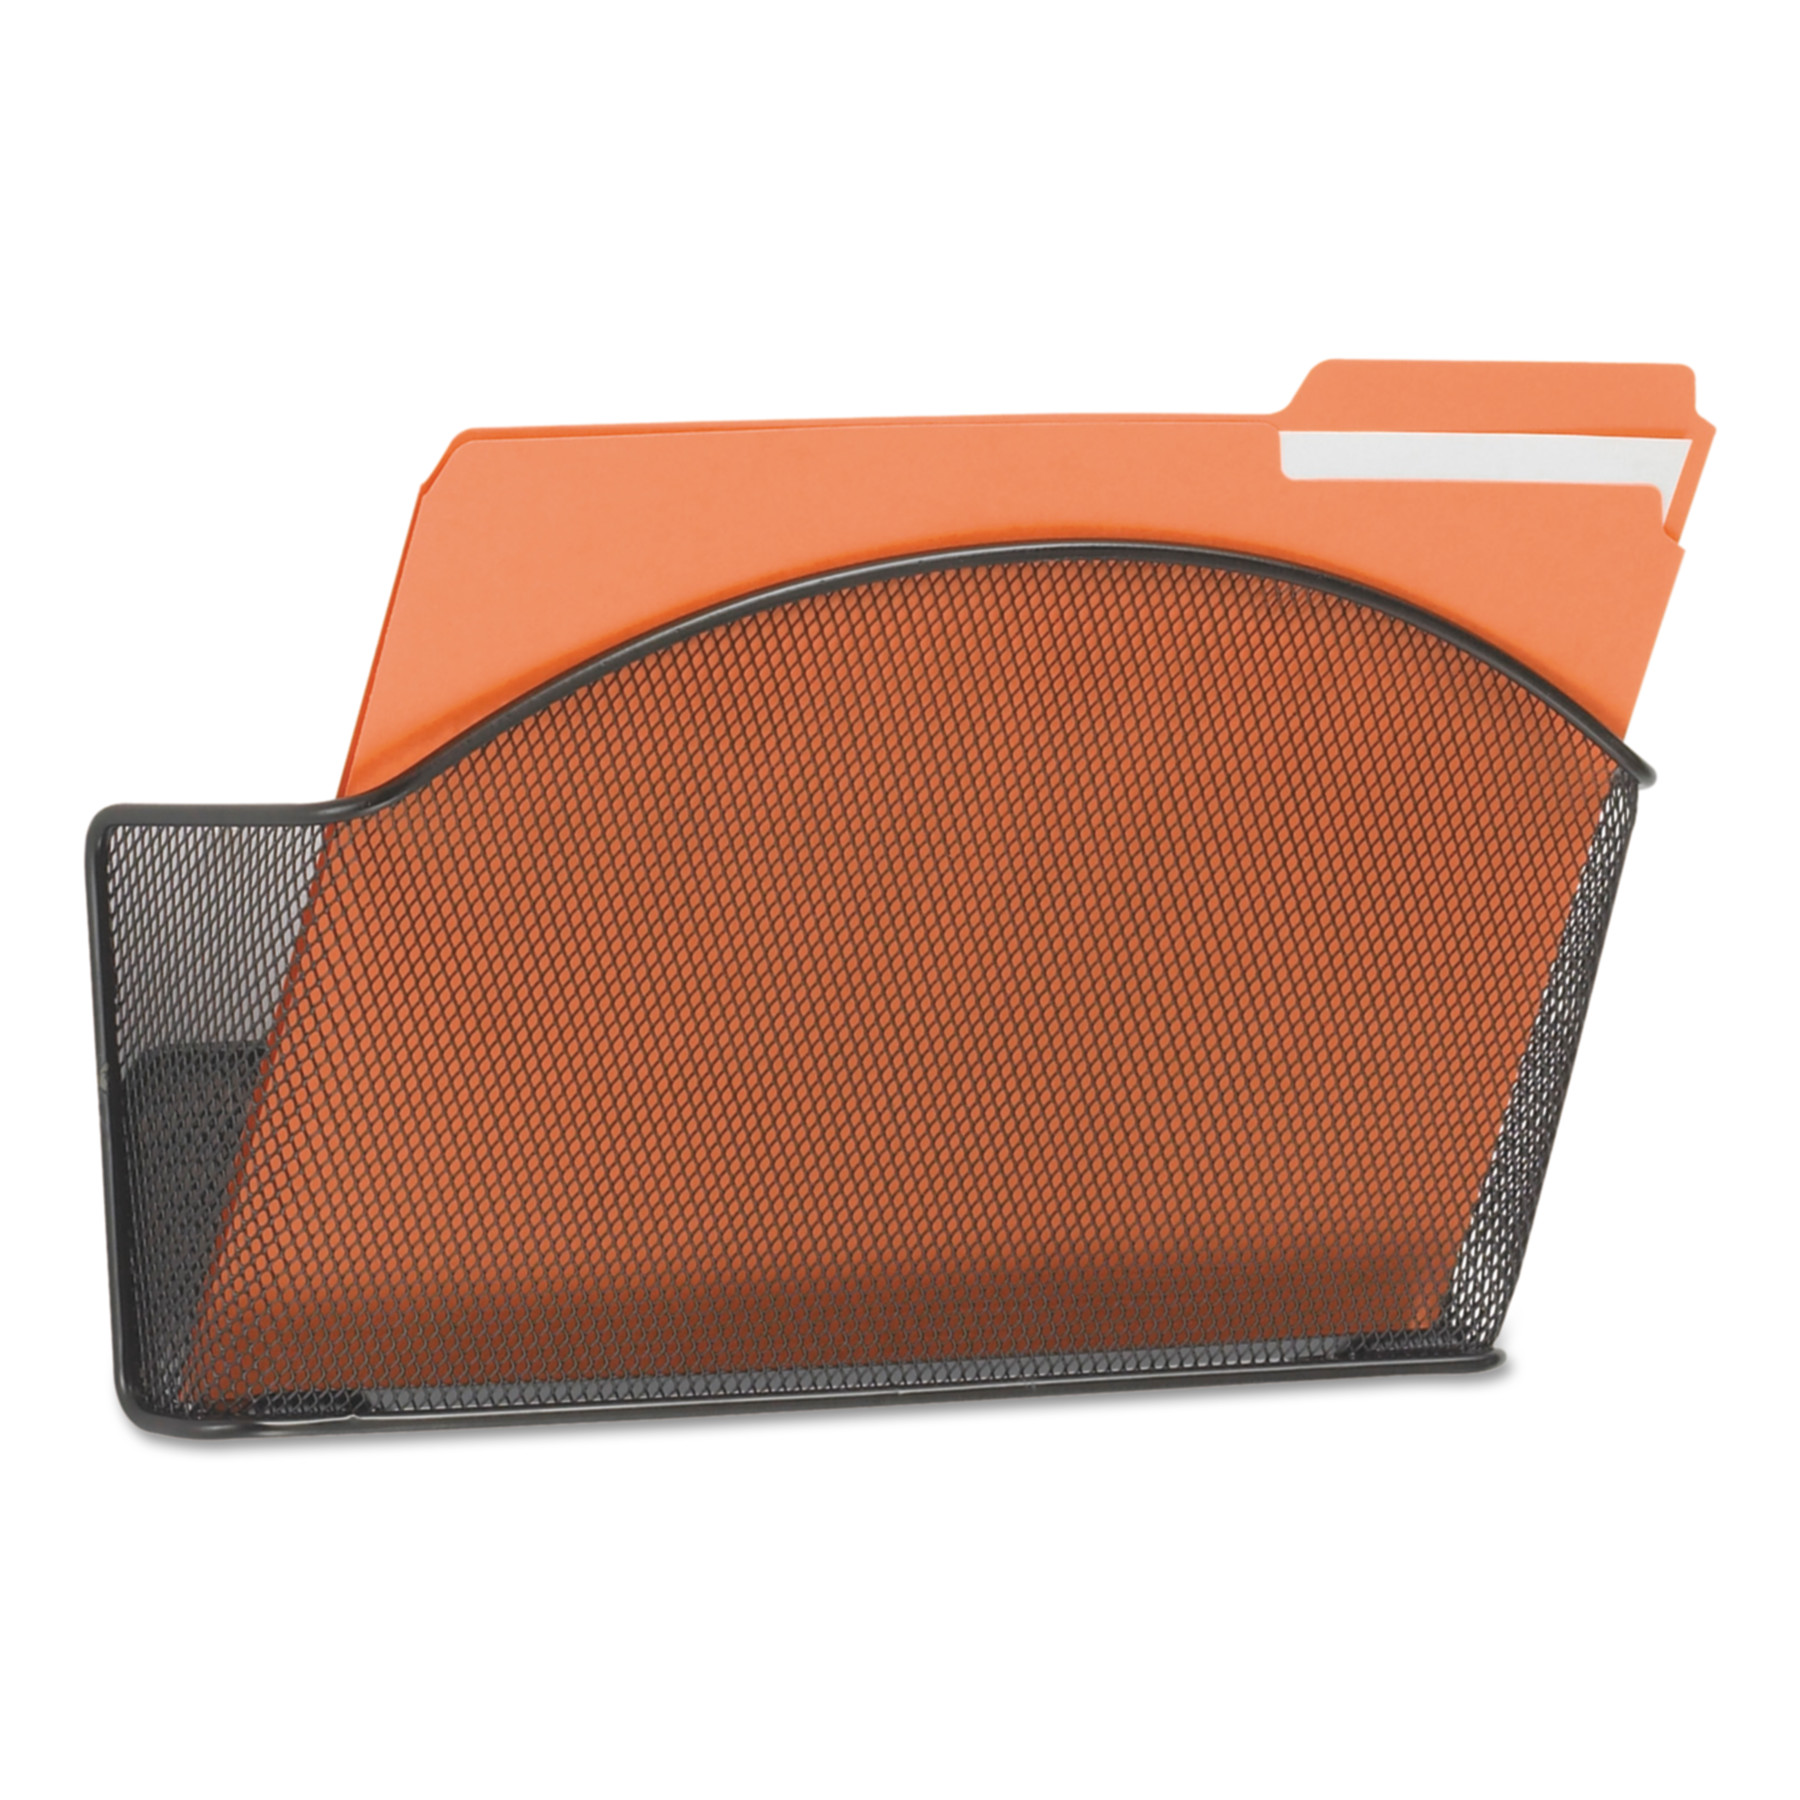 Safco Onyx Steel Wall Pocket, Letter, Black, 12 x 3 x 9